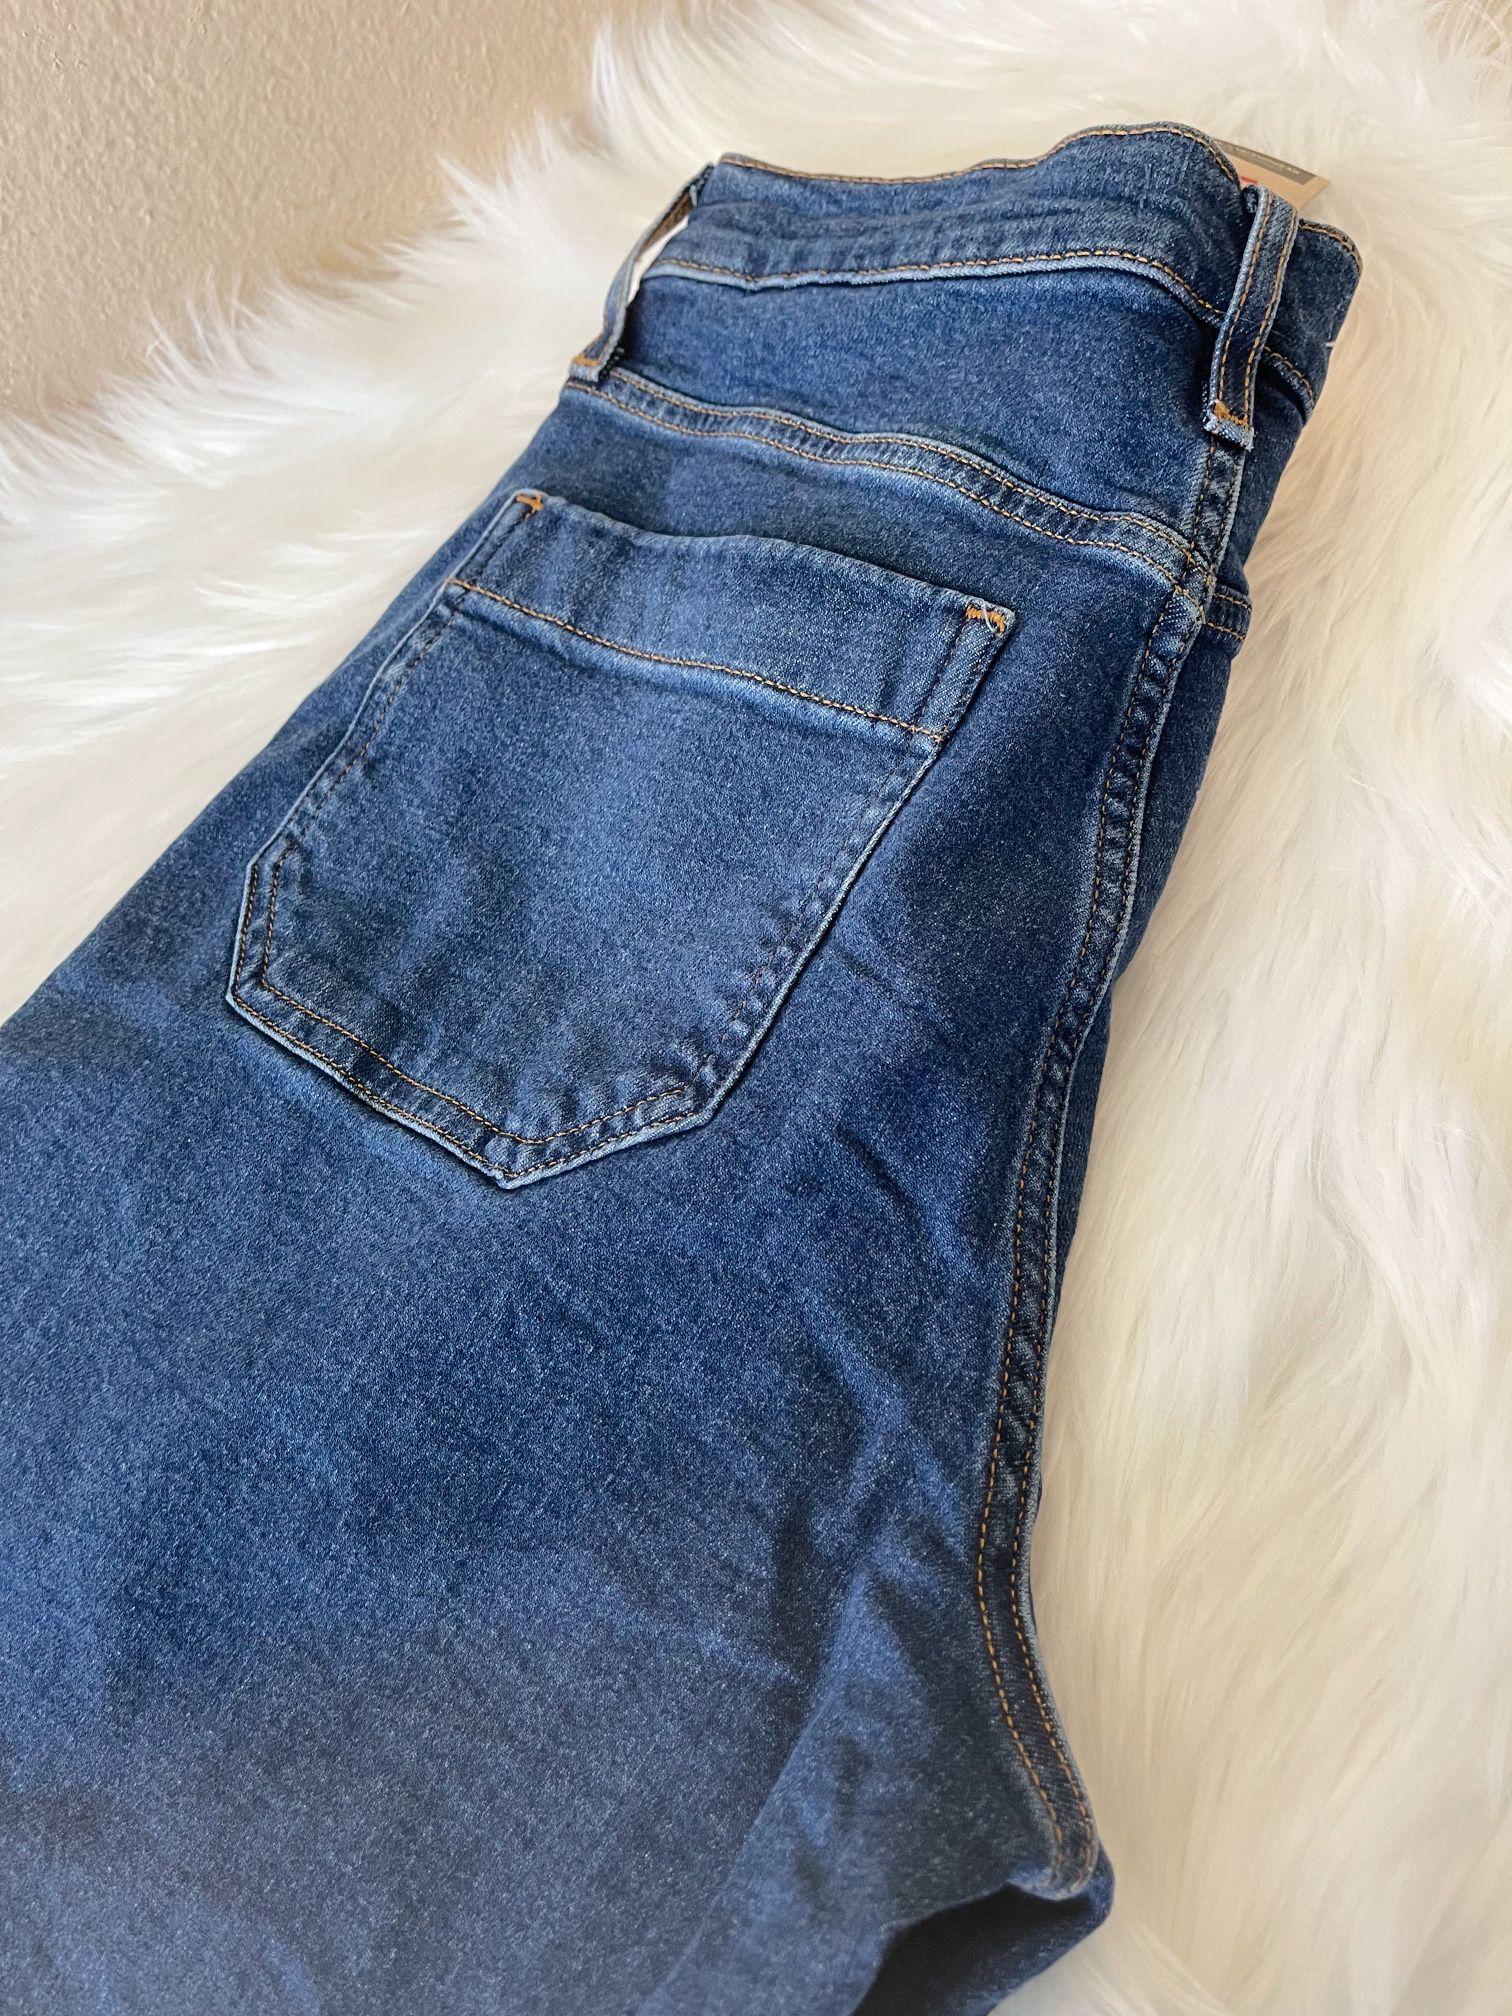 Levi's Mile High Cropped Wide Leg Pants